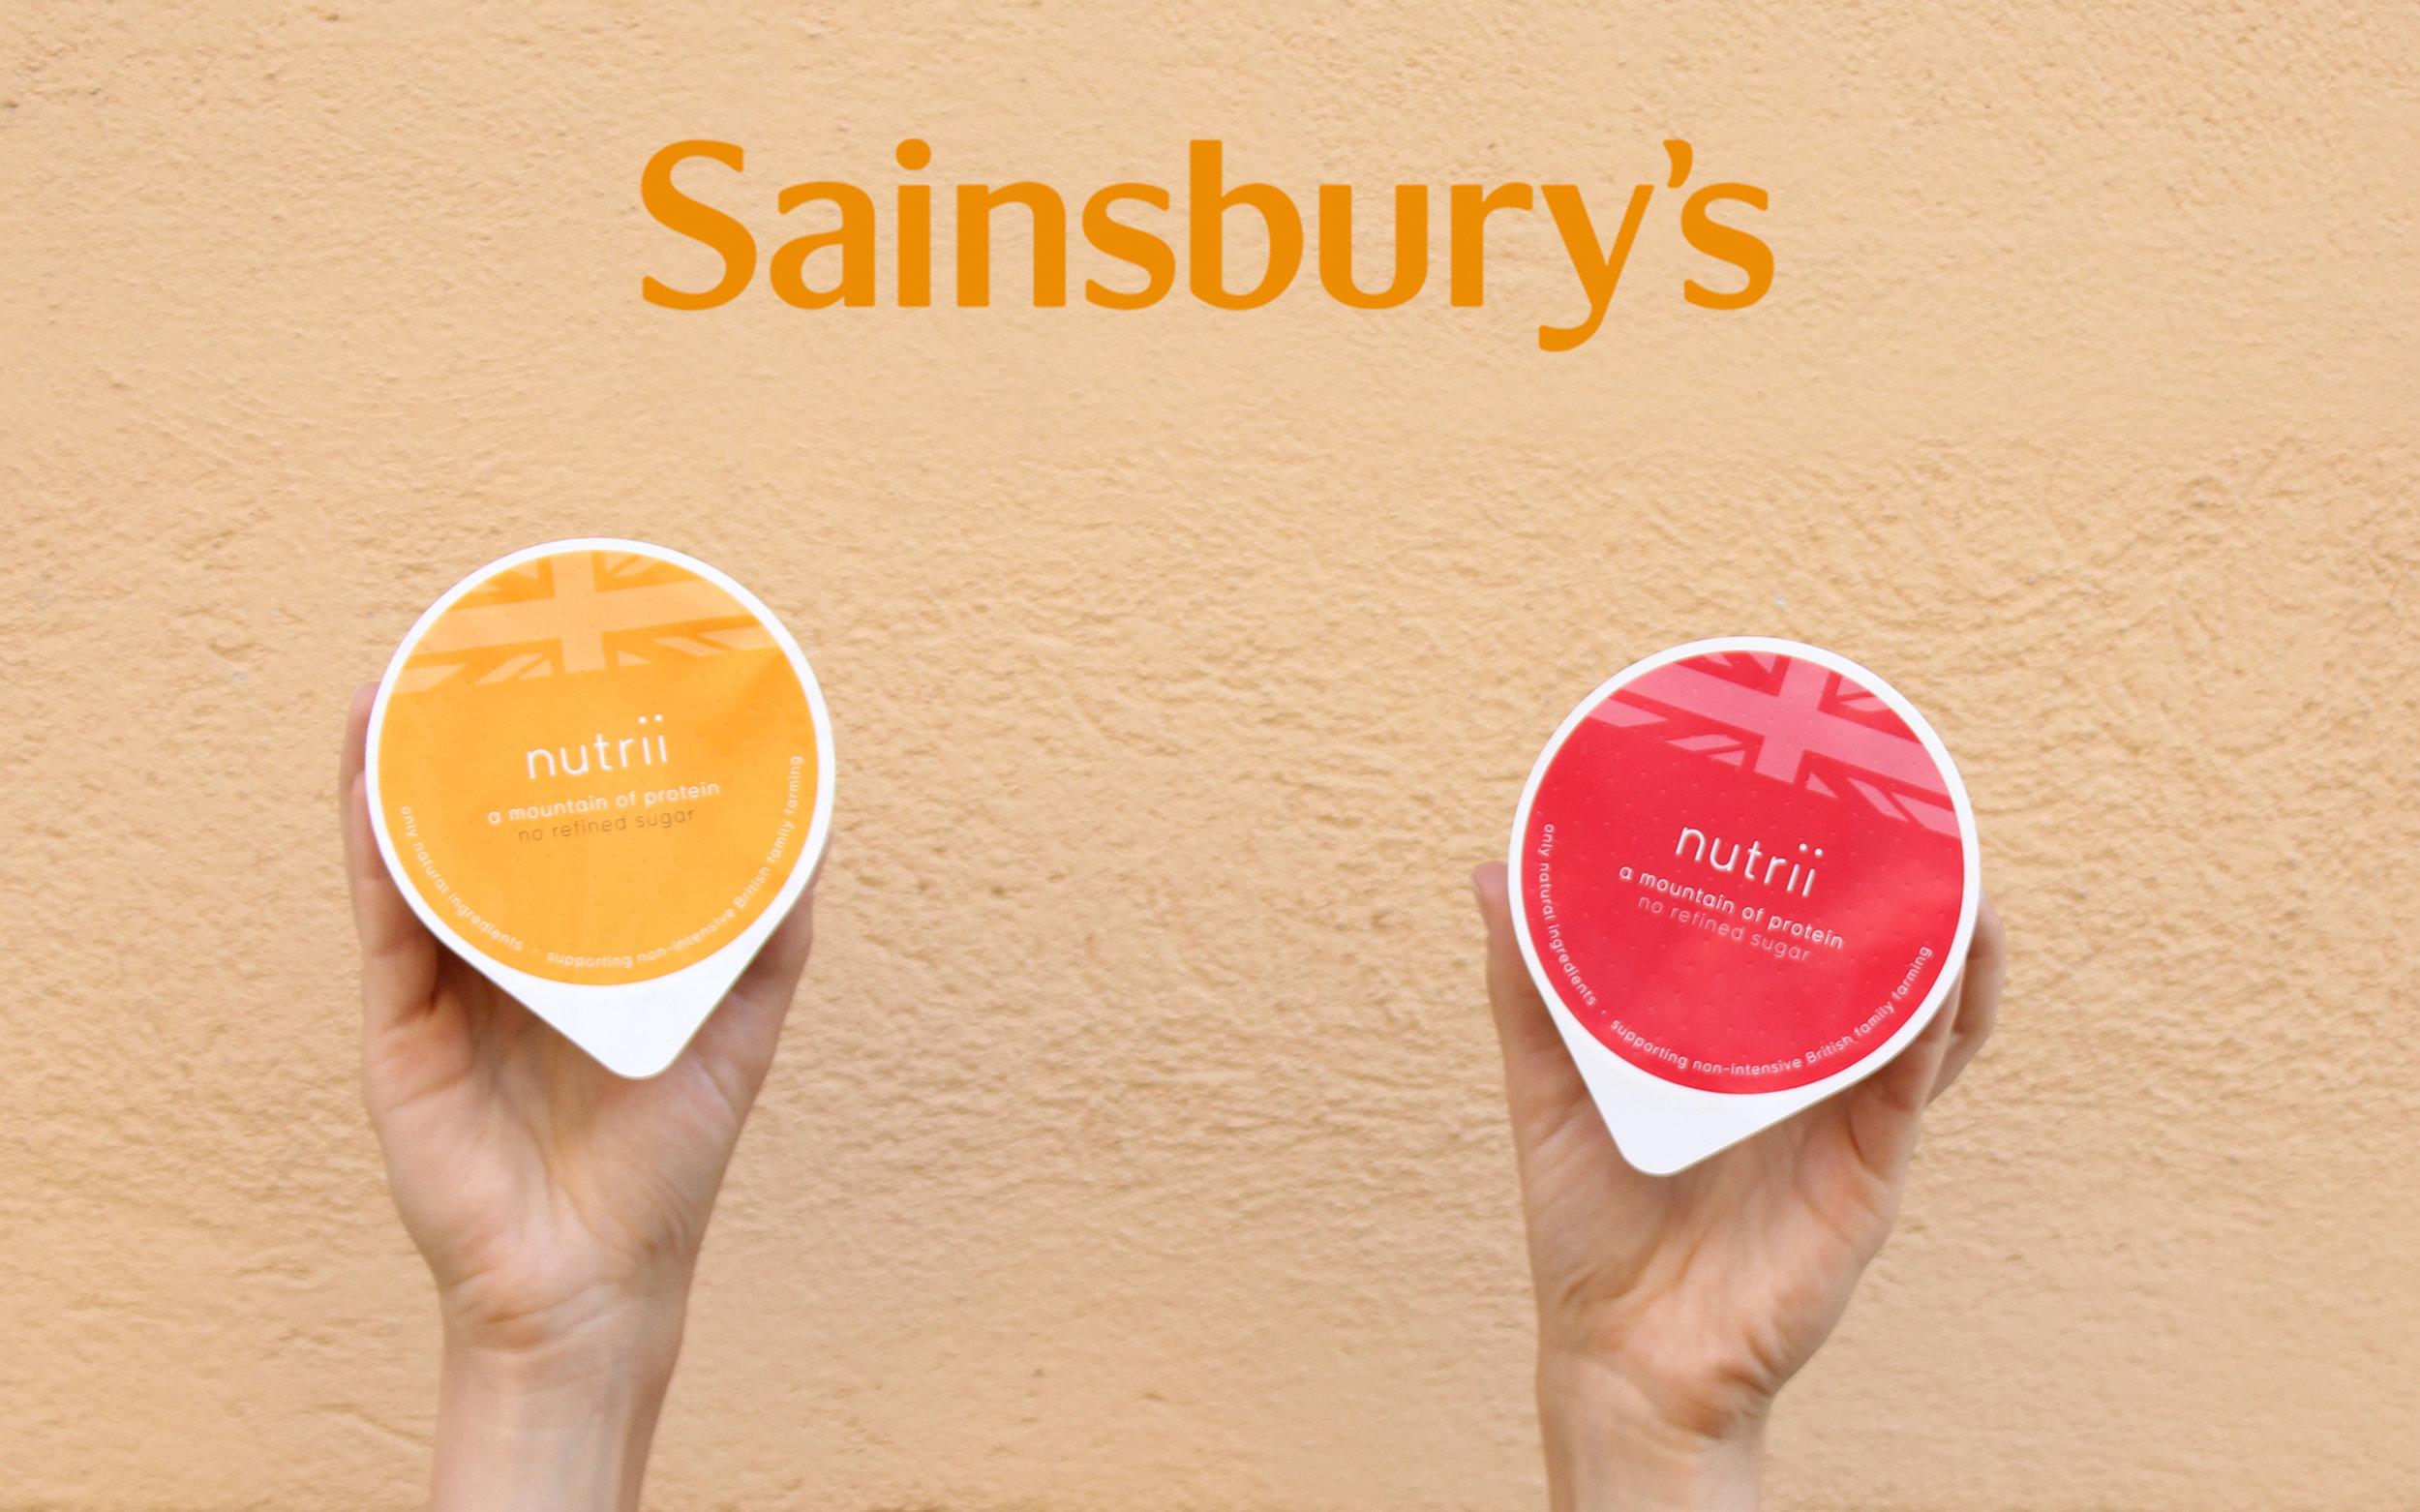 mango raspberry pot Sainsbury's v2.jpg